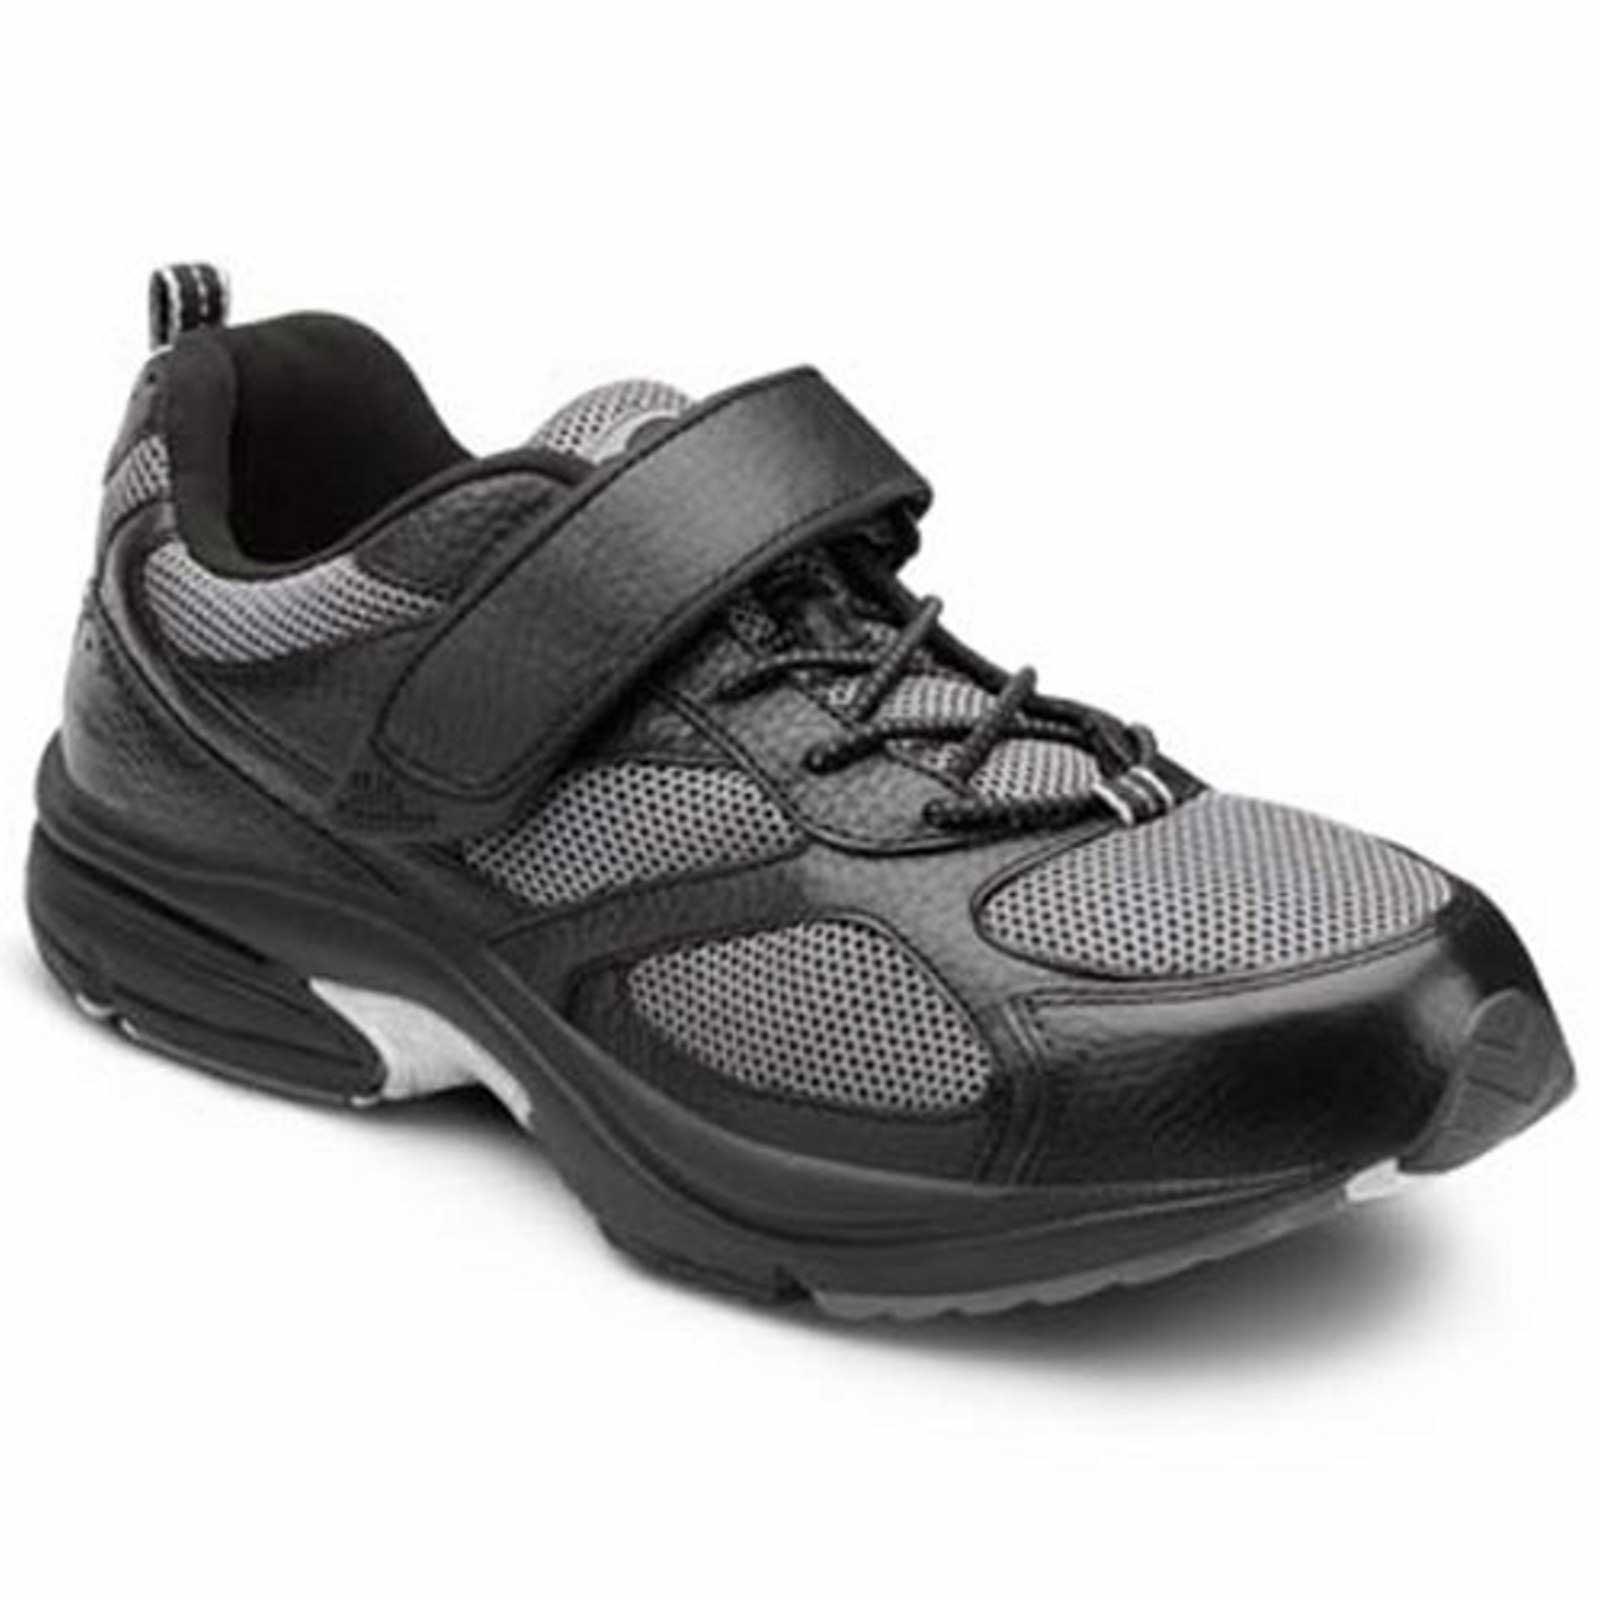 Dr Comfort Endurance Men's Therapeutic Diabetic Extra ...